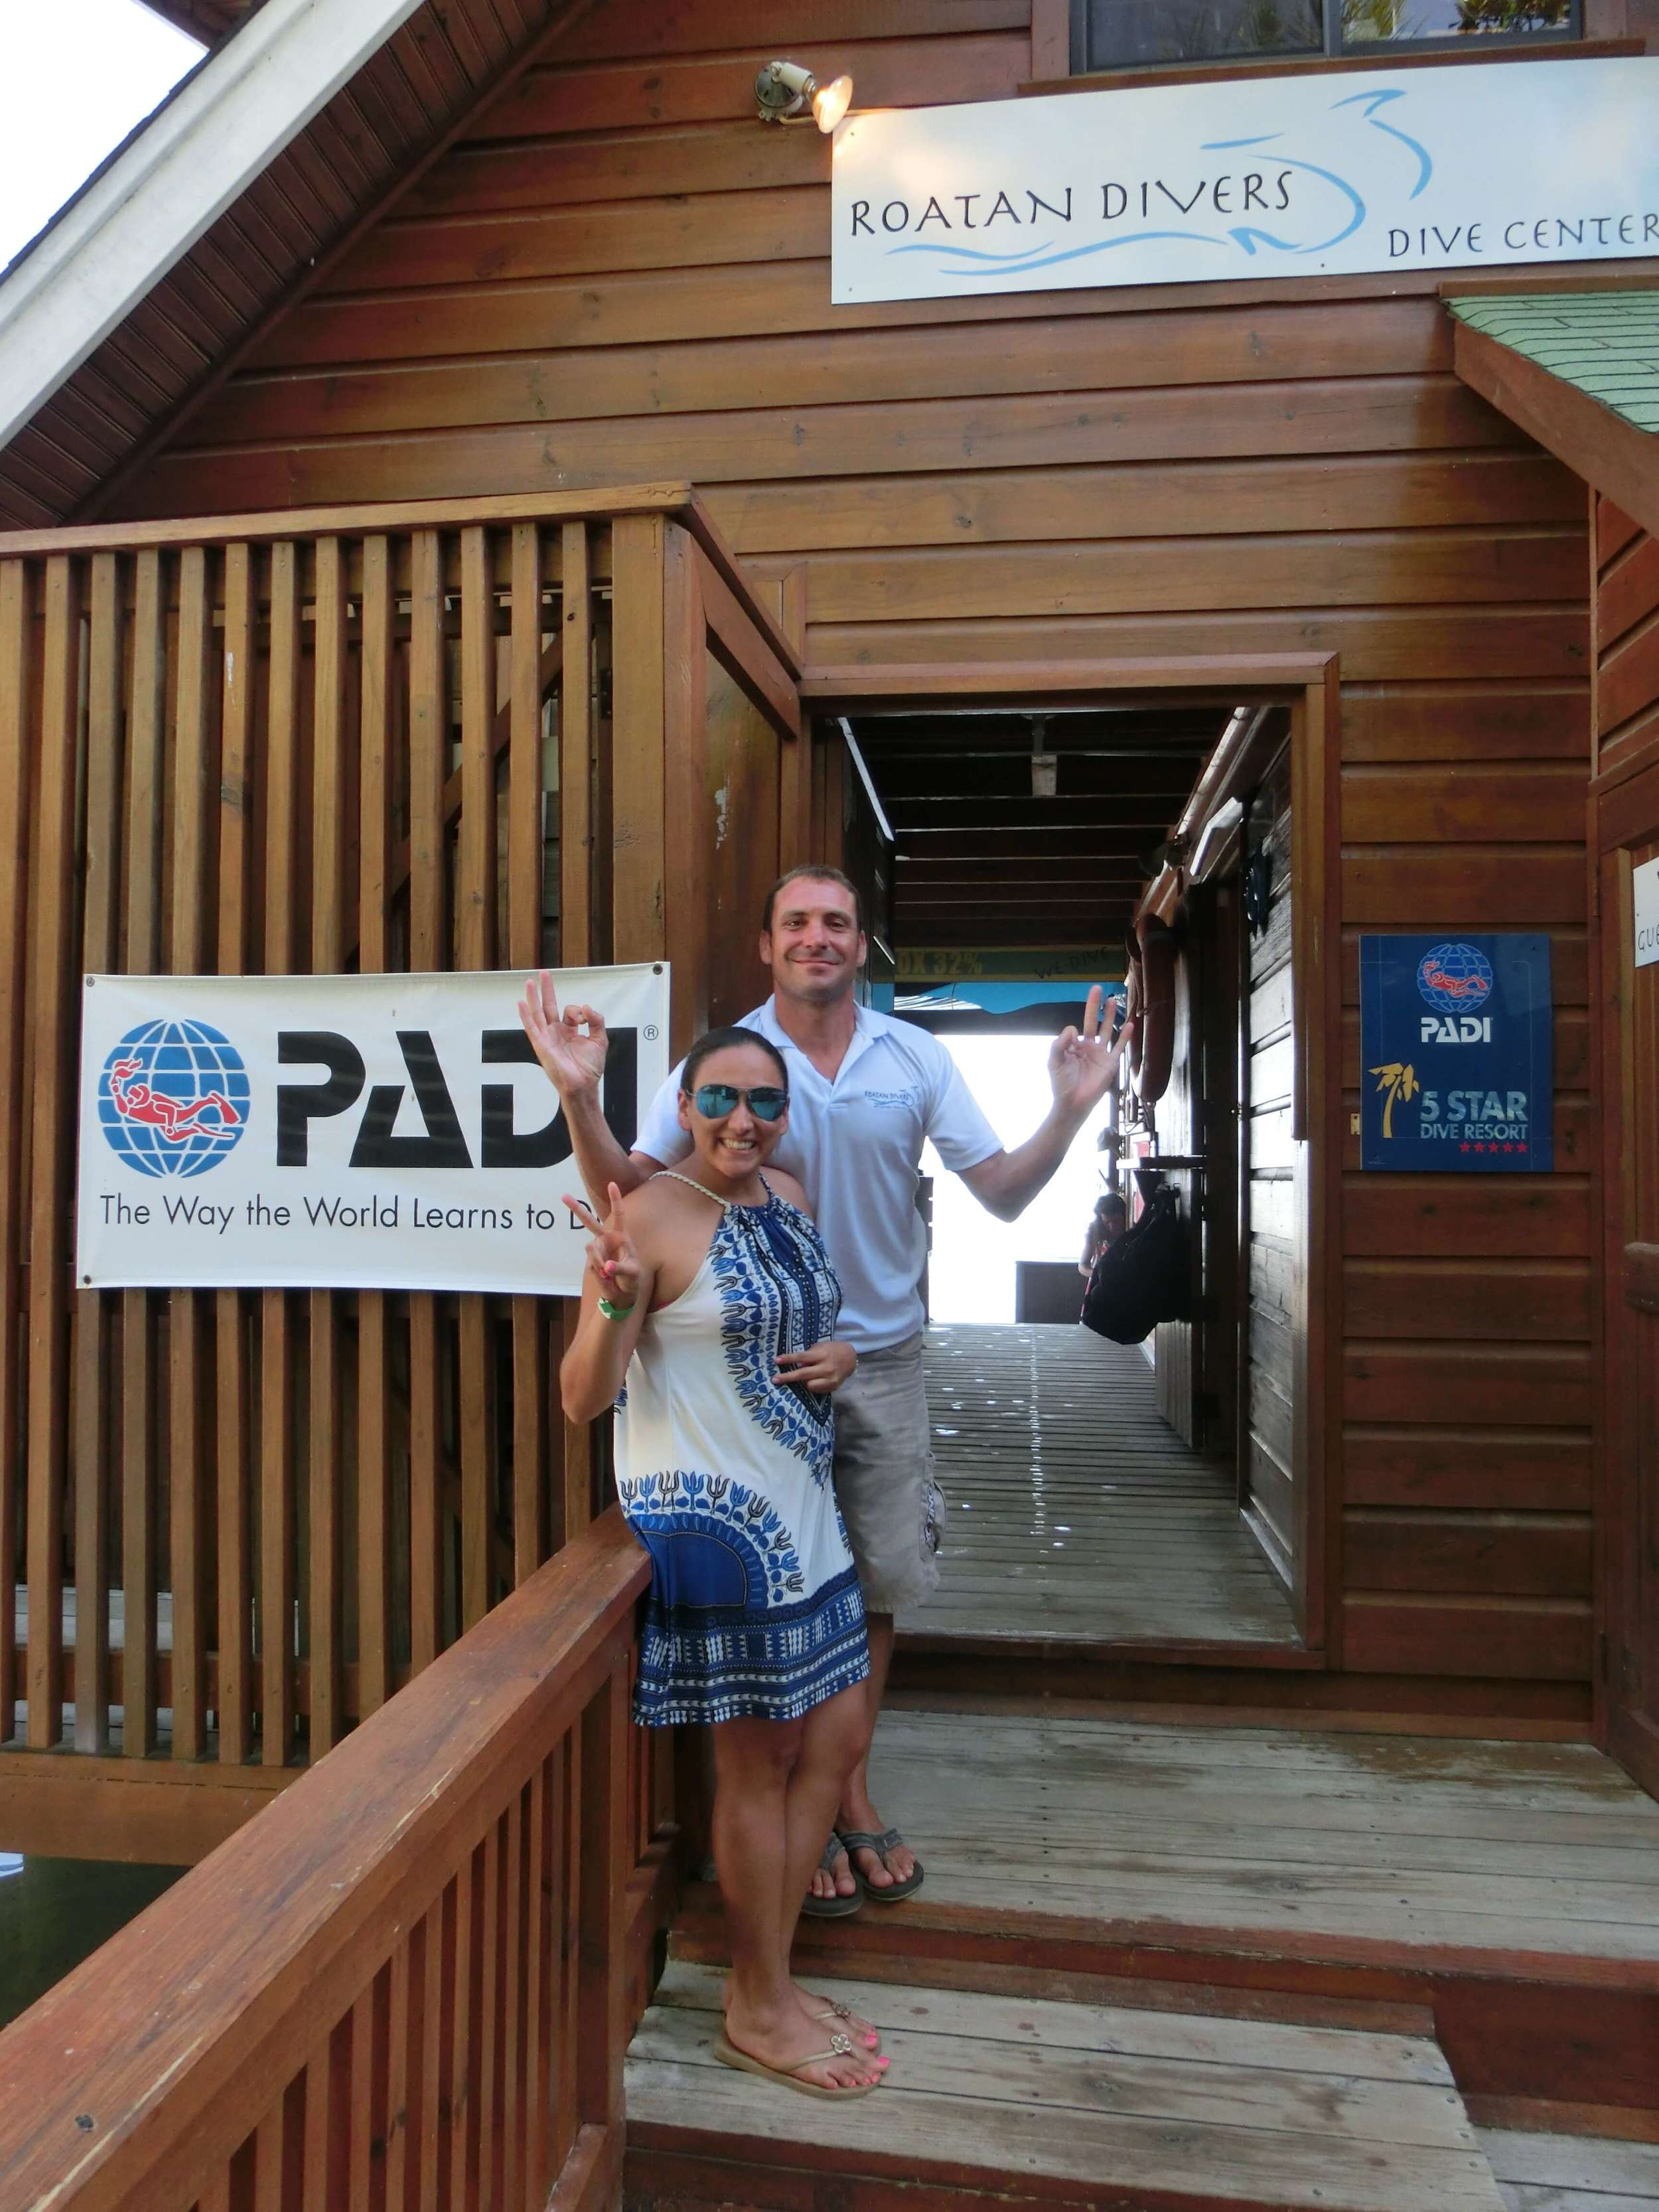 Lina PADI Open Water course Roatan Divers